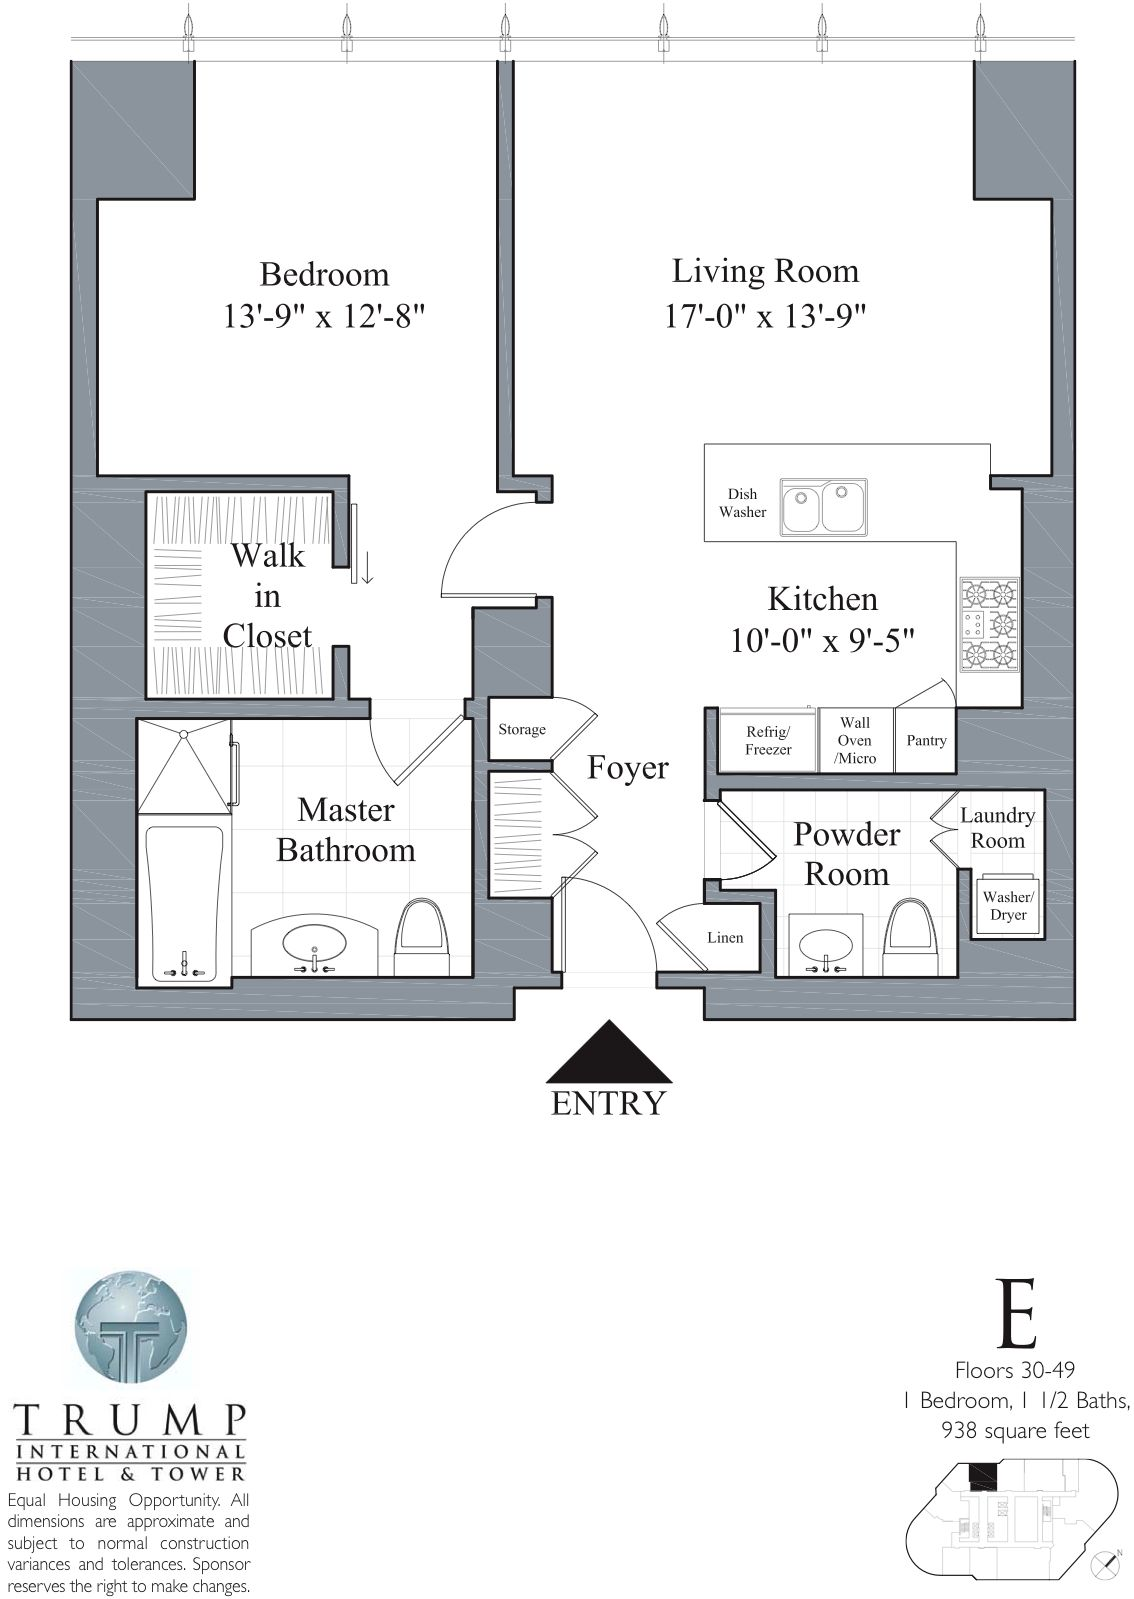 1 Bed 1 5 Bath Tier E Trump Tower Chicago Floor Plan Inspirasi Bangunan Gedung